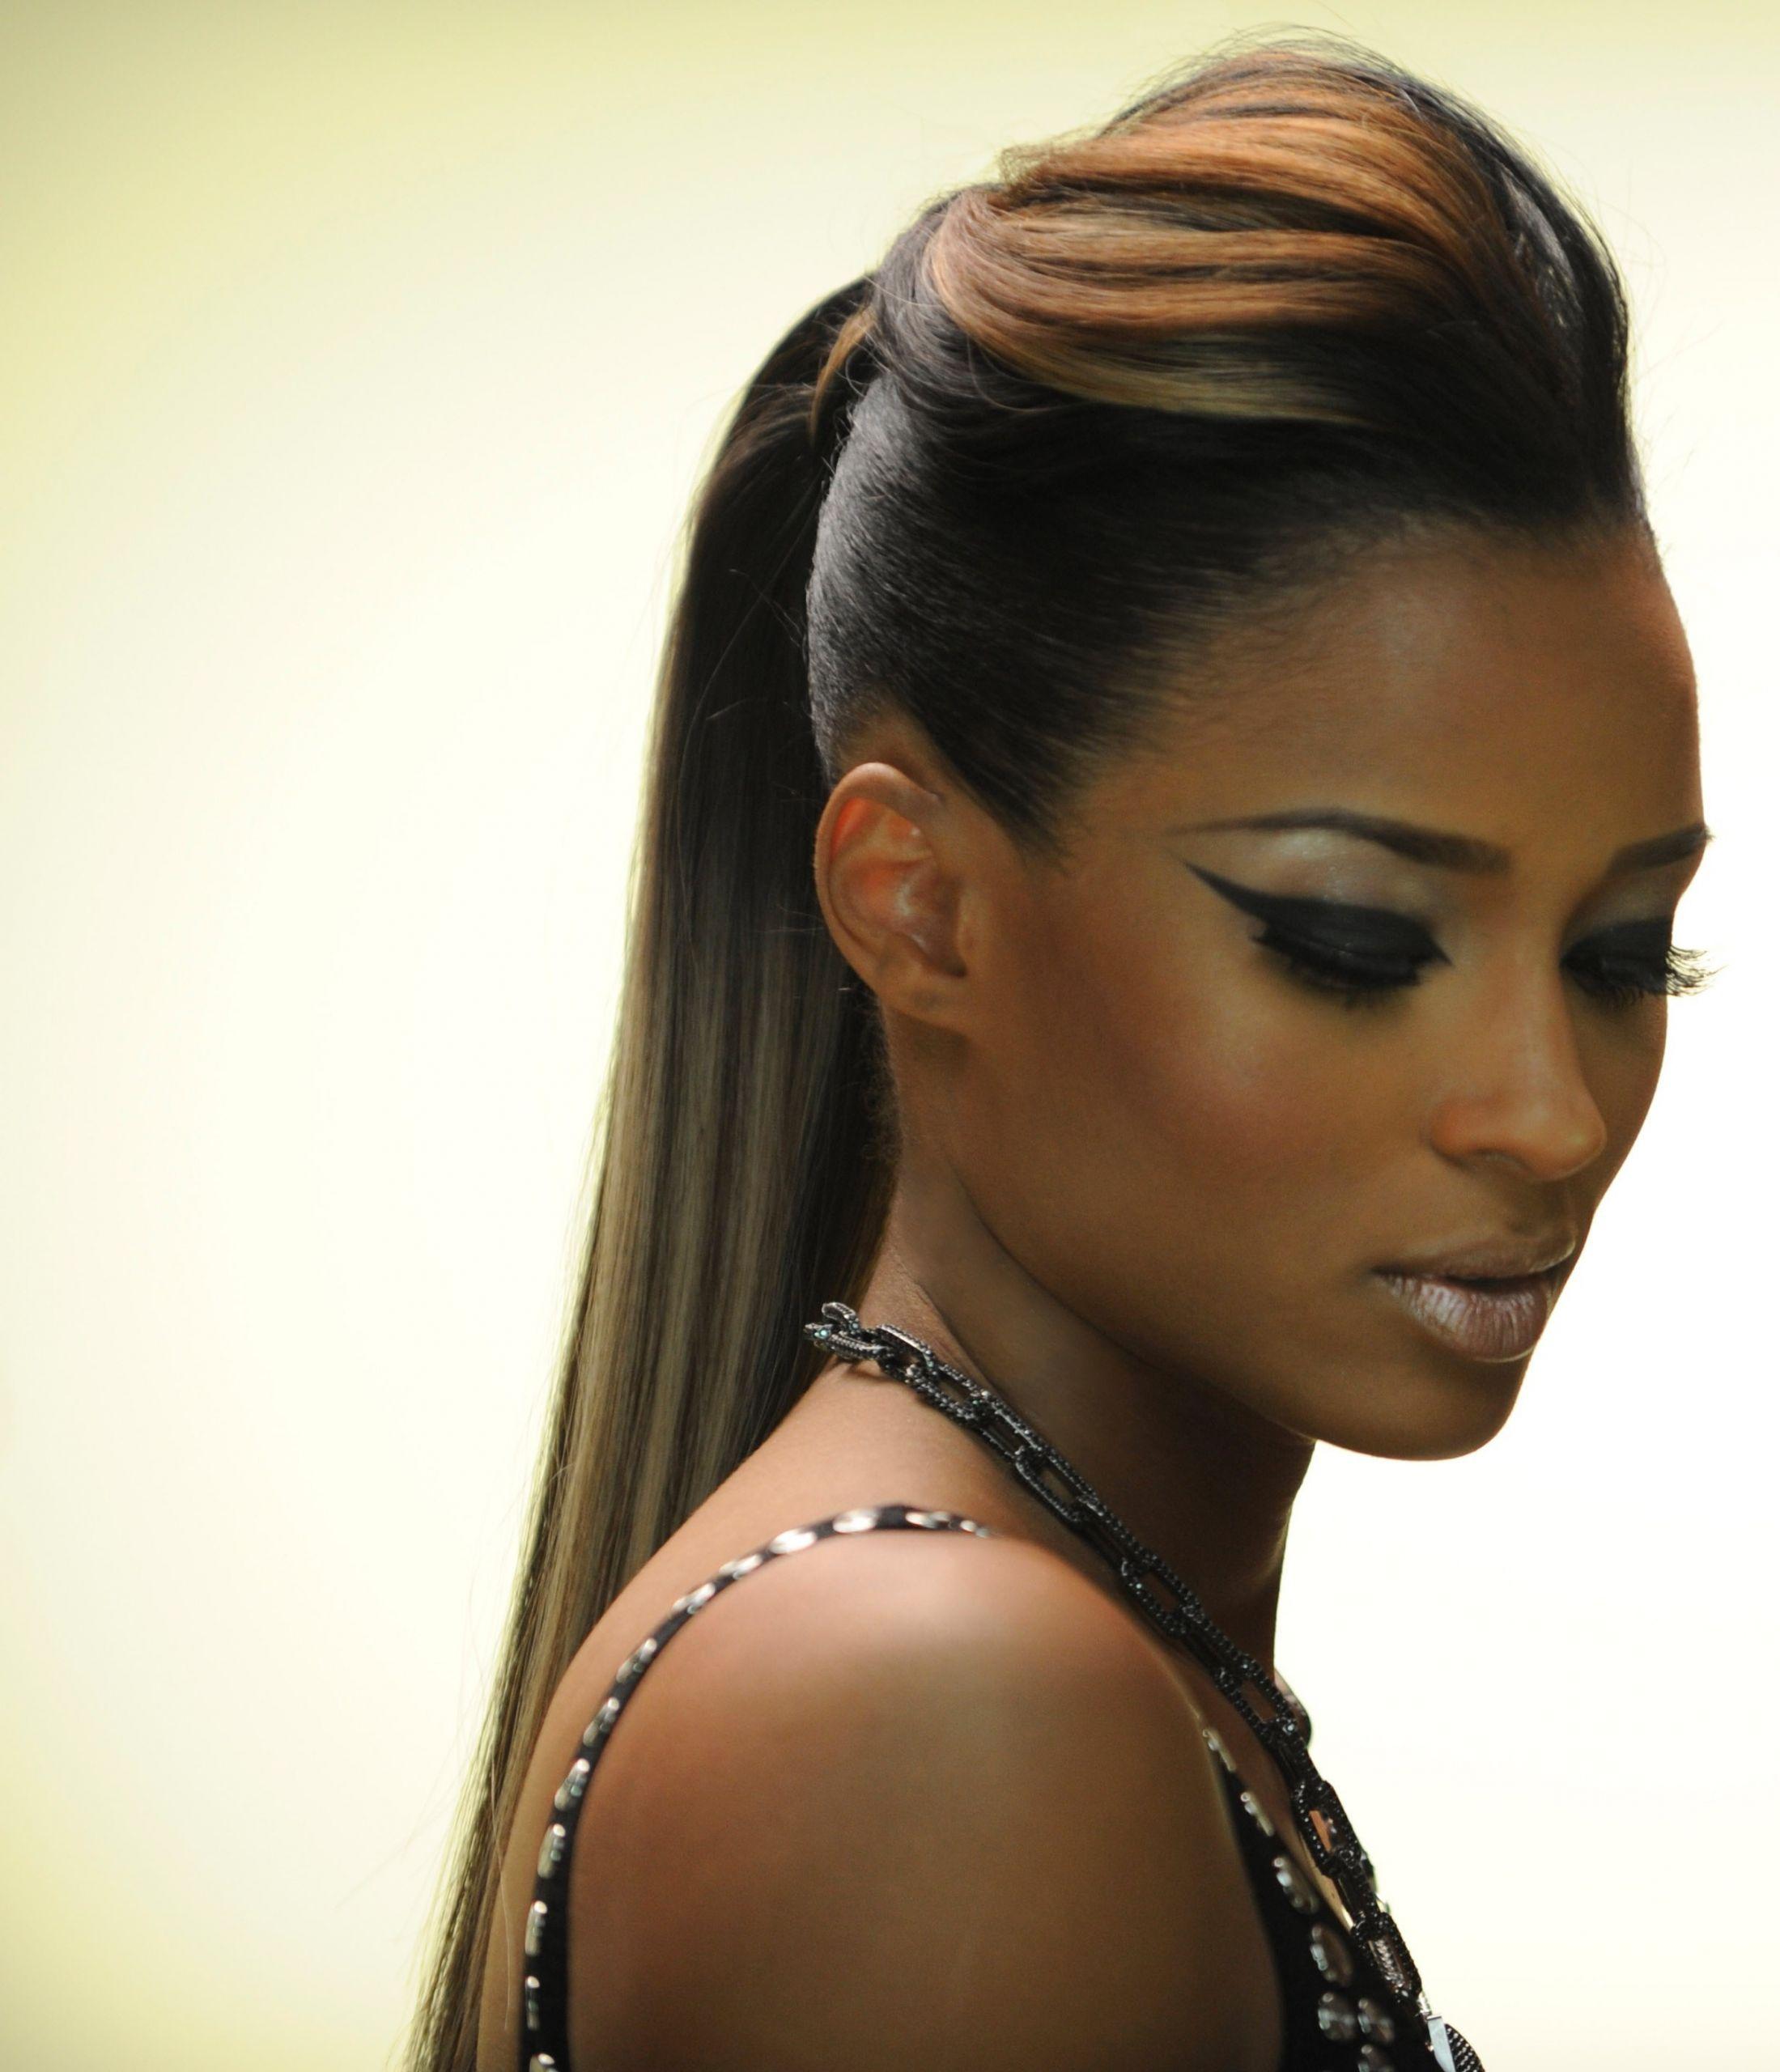 black ponytail updo hairstyles beautiful 15 best of black ponytail updo hairstyles of black ponytail updo hairstyles scaled 1